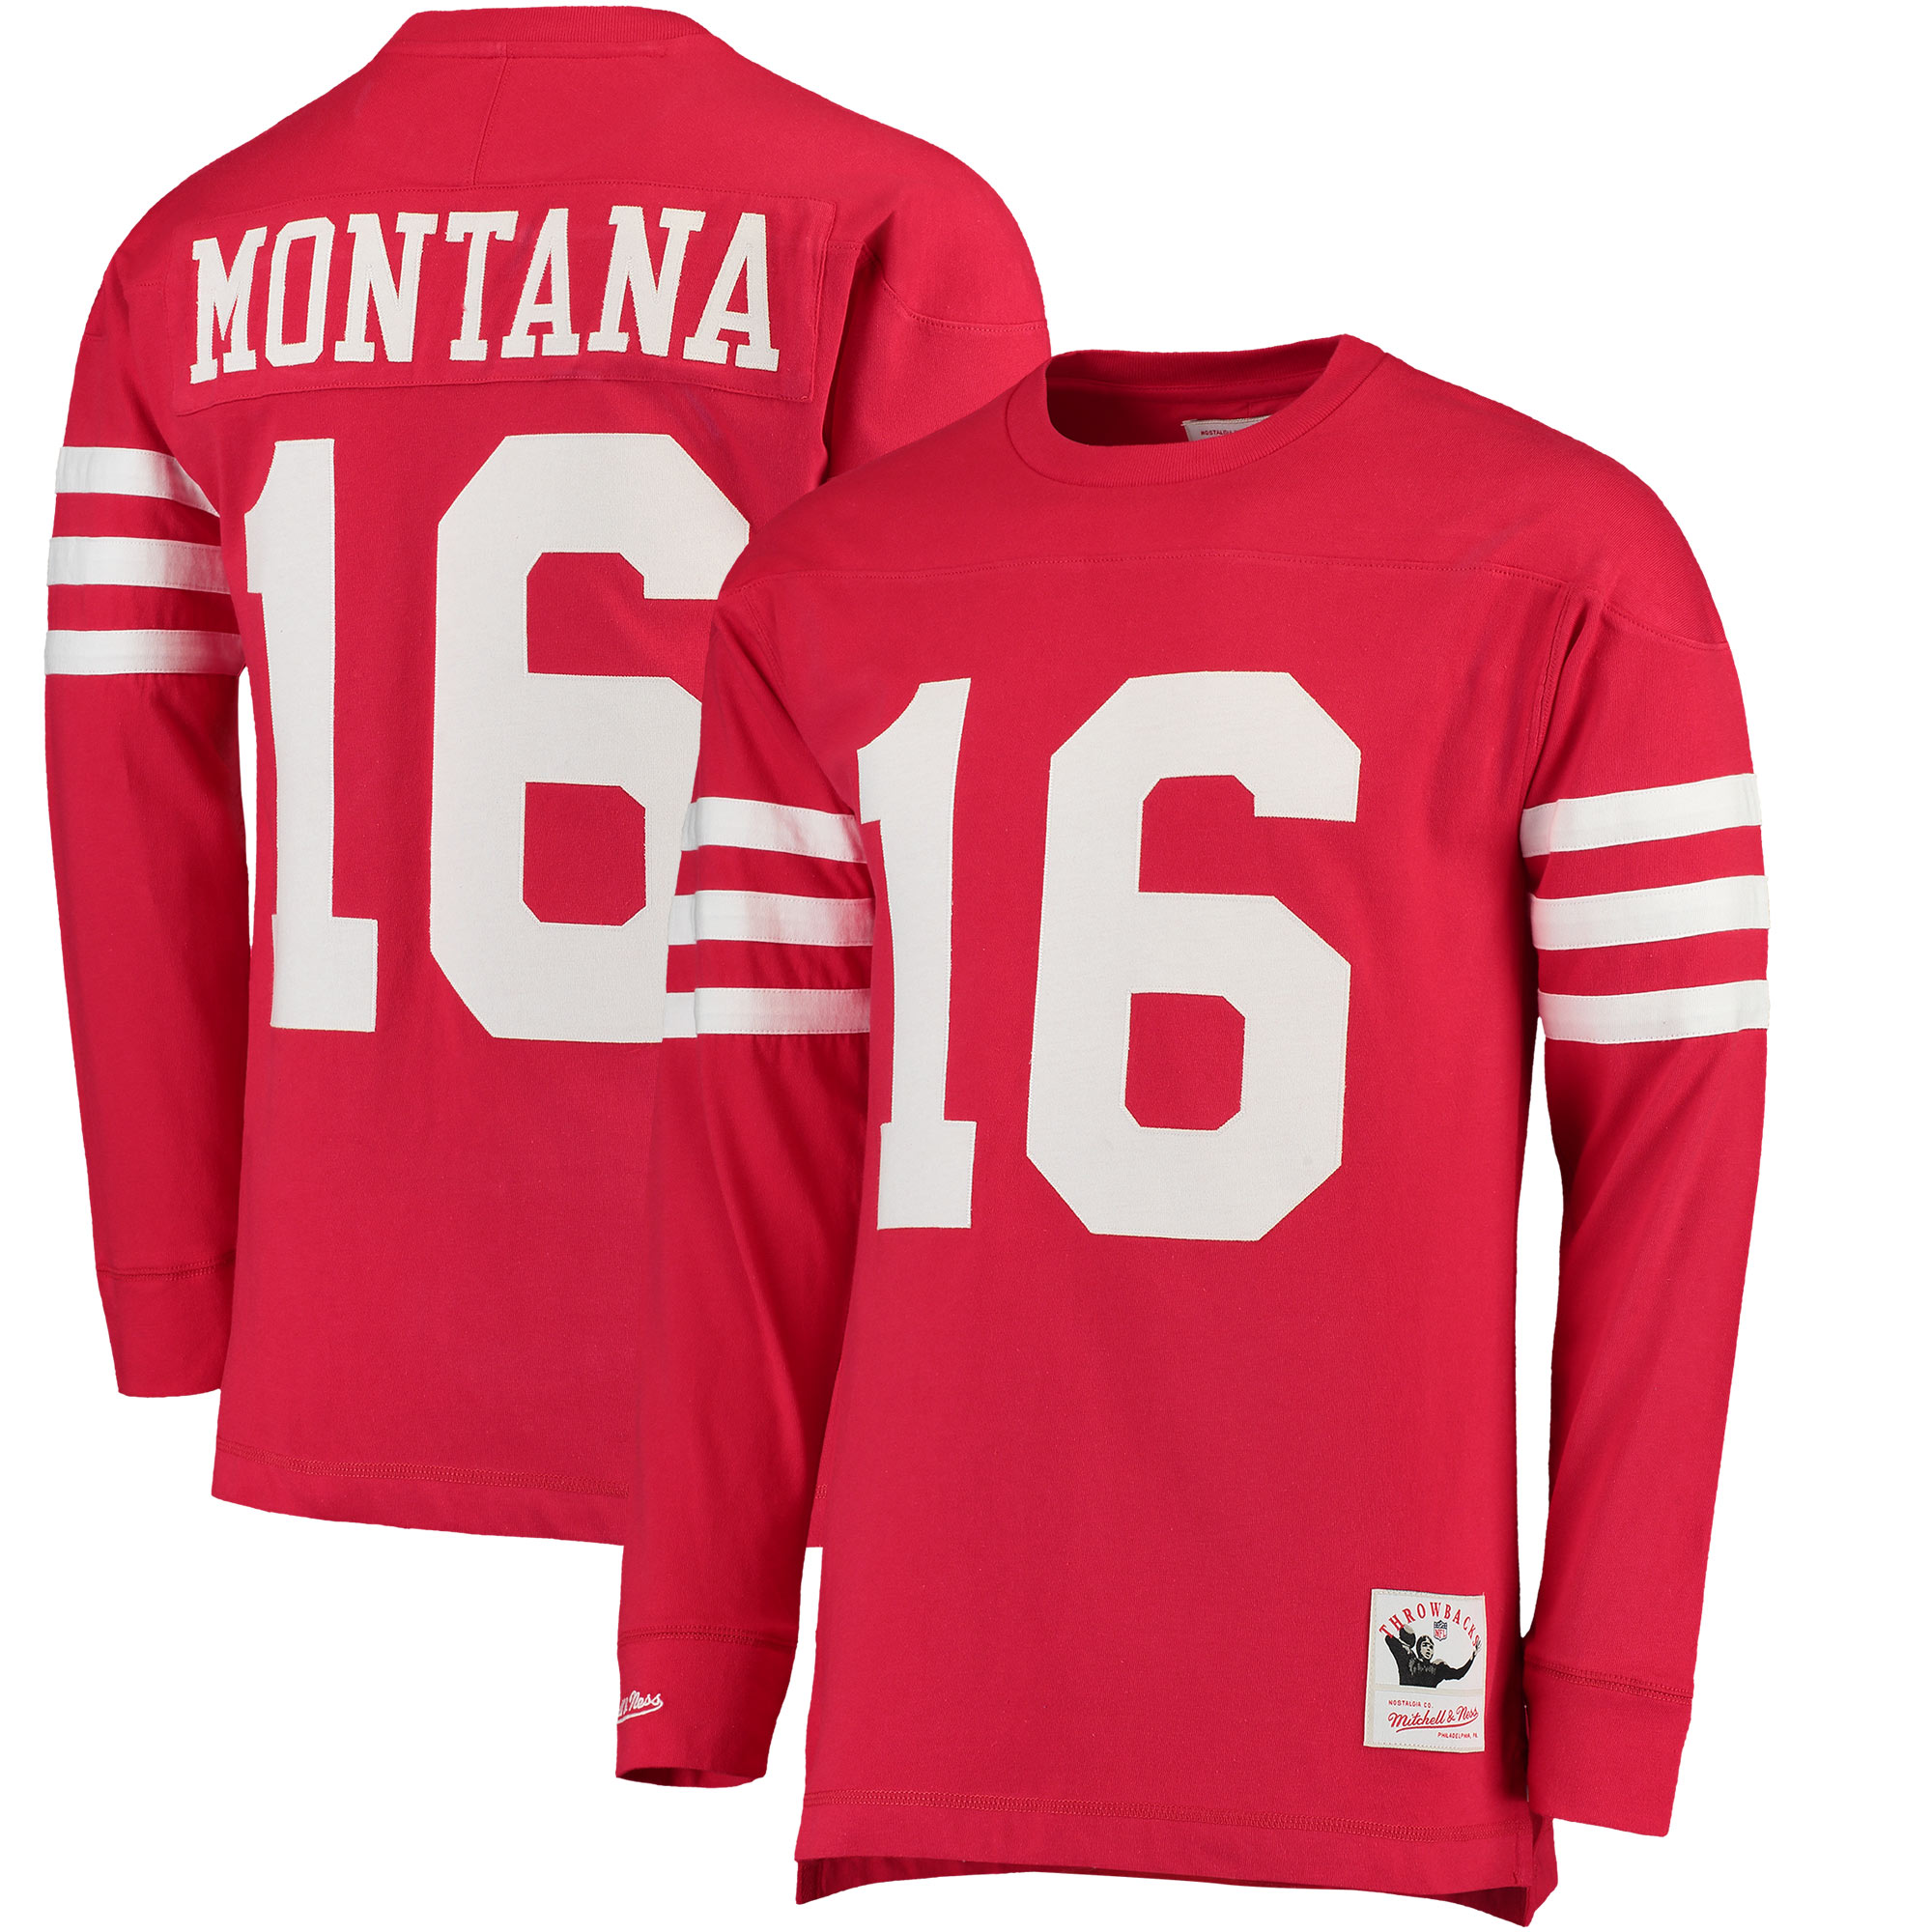 uk availability 93f53 444c8 Joe Montana San Francisco 49ers NFL Mitchell & Ness Red 1989 Jersey  Inspired Longsleeve Knit Shirt For Men